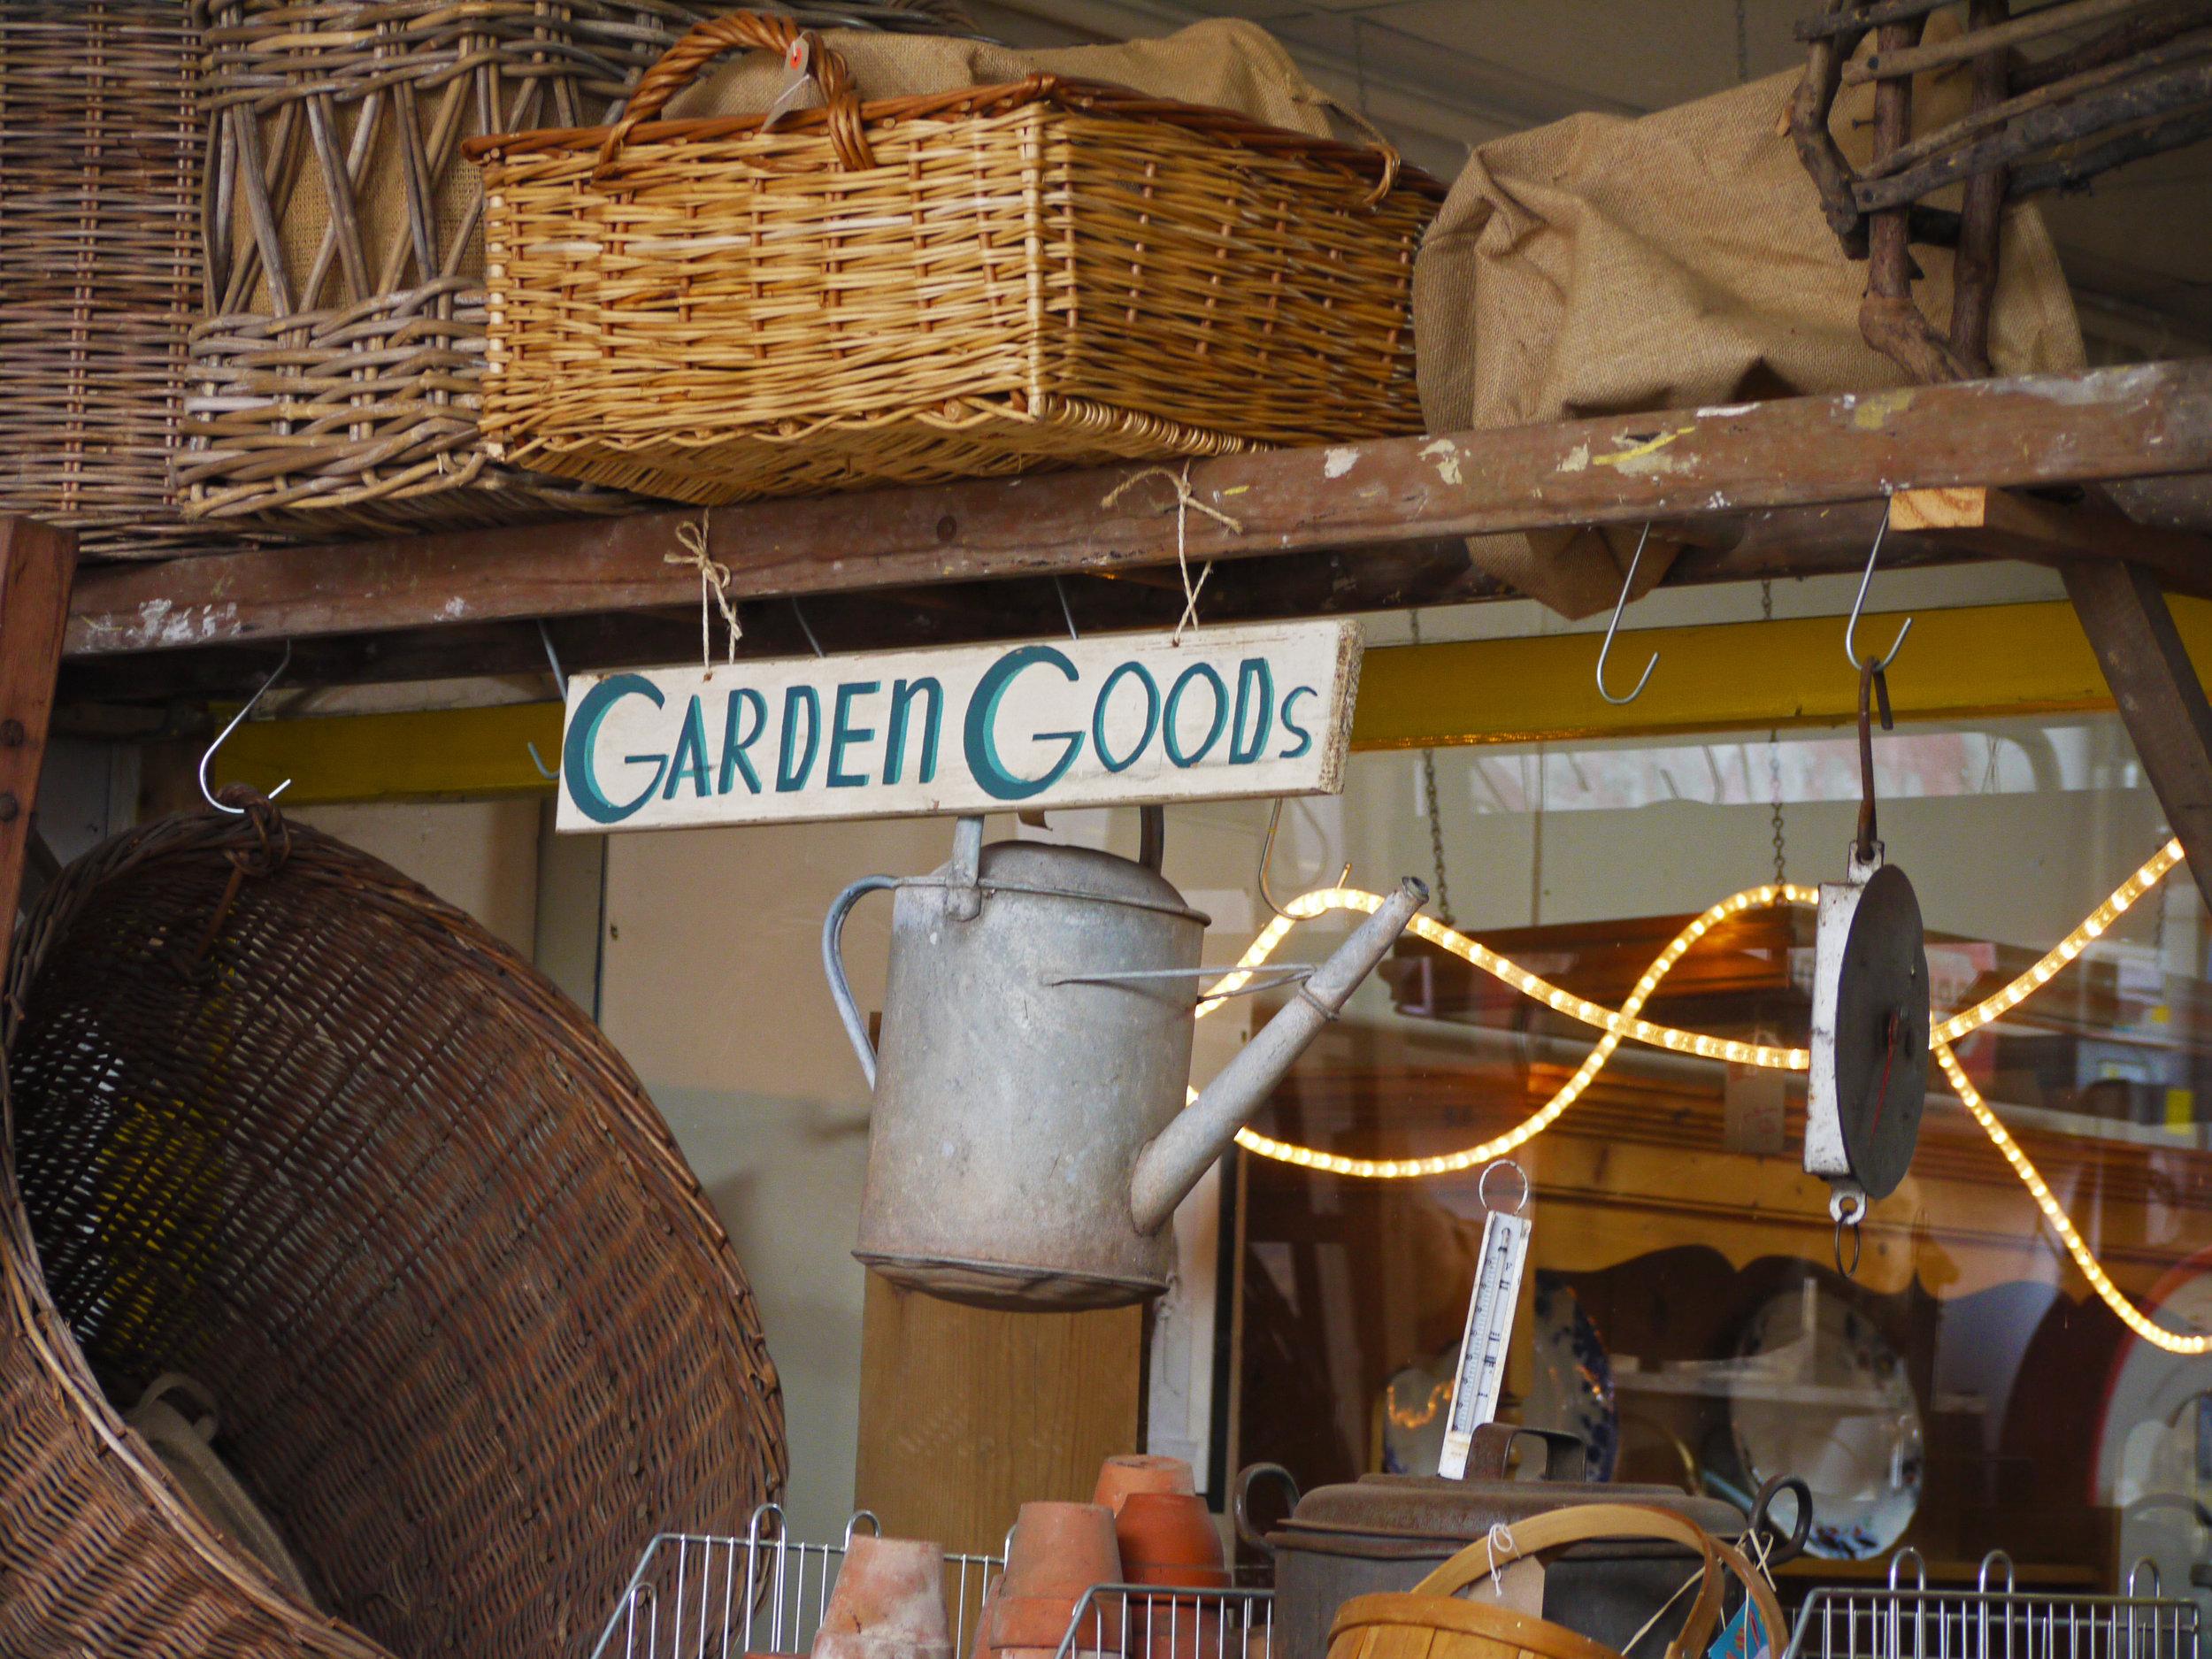 gardengoods.JPG